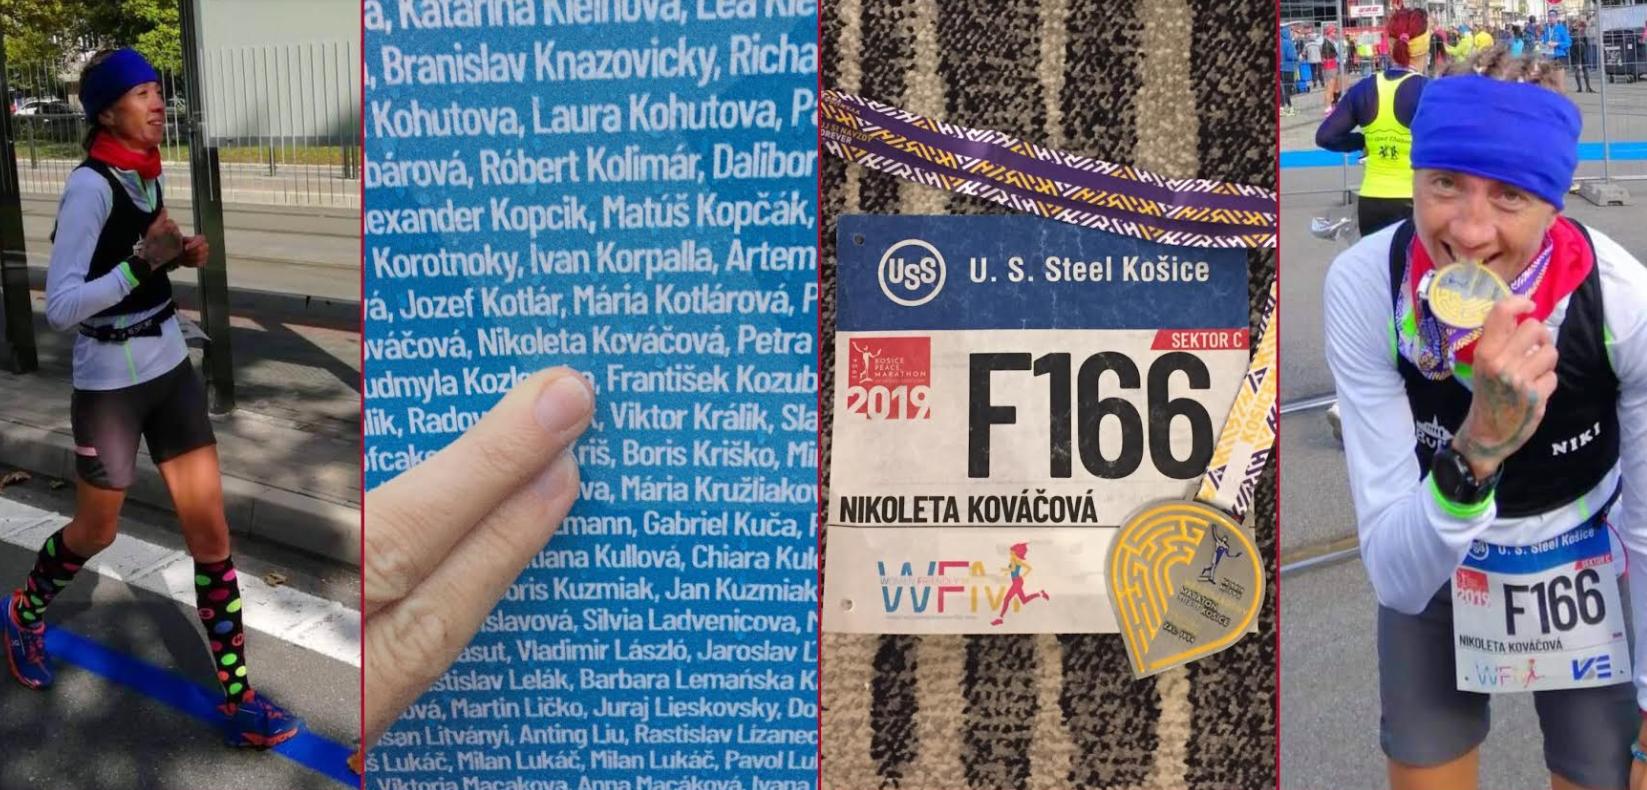 Kosicky maraton Nikoleta Kovacova